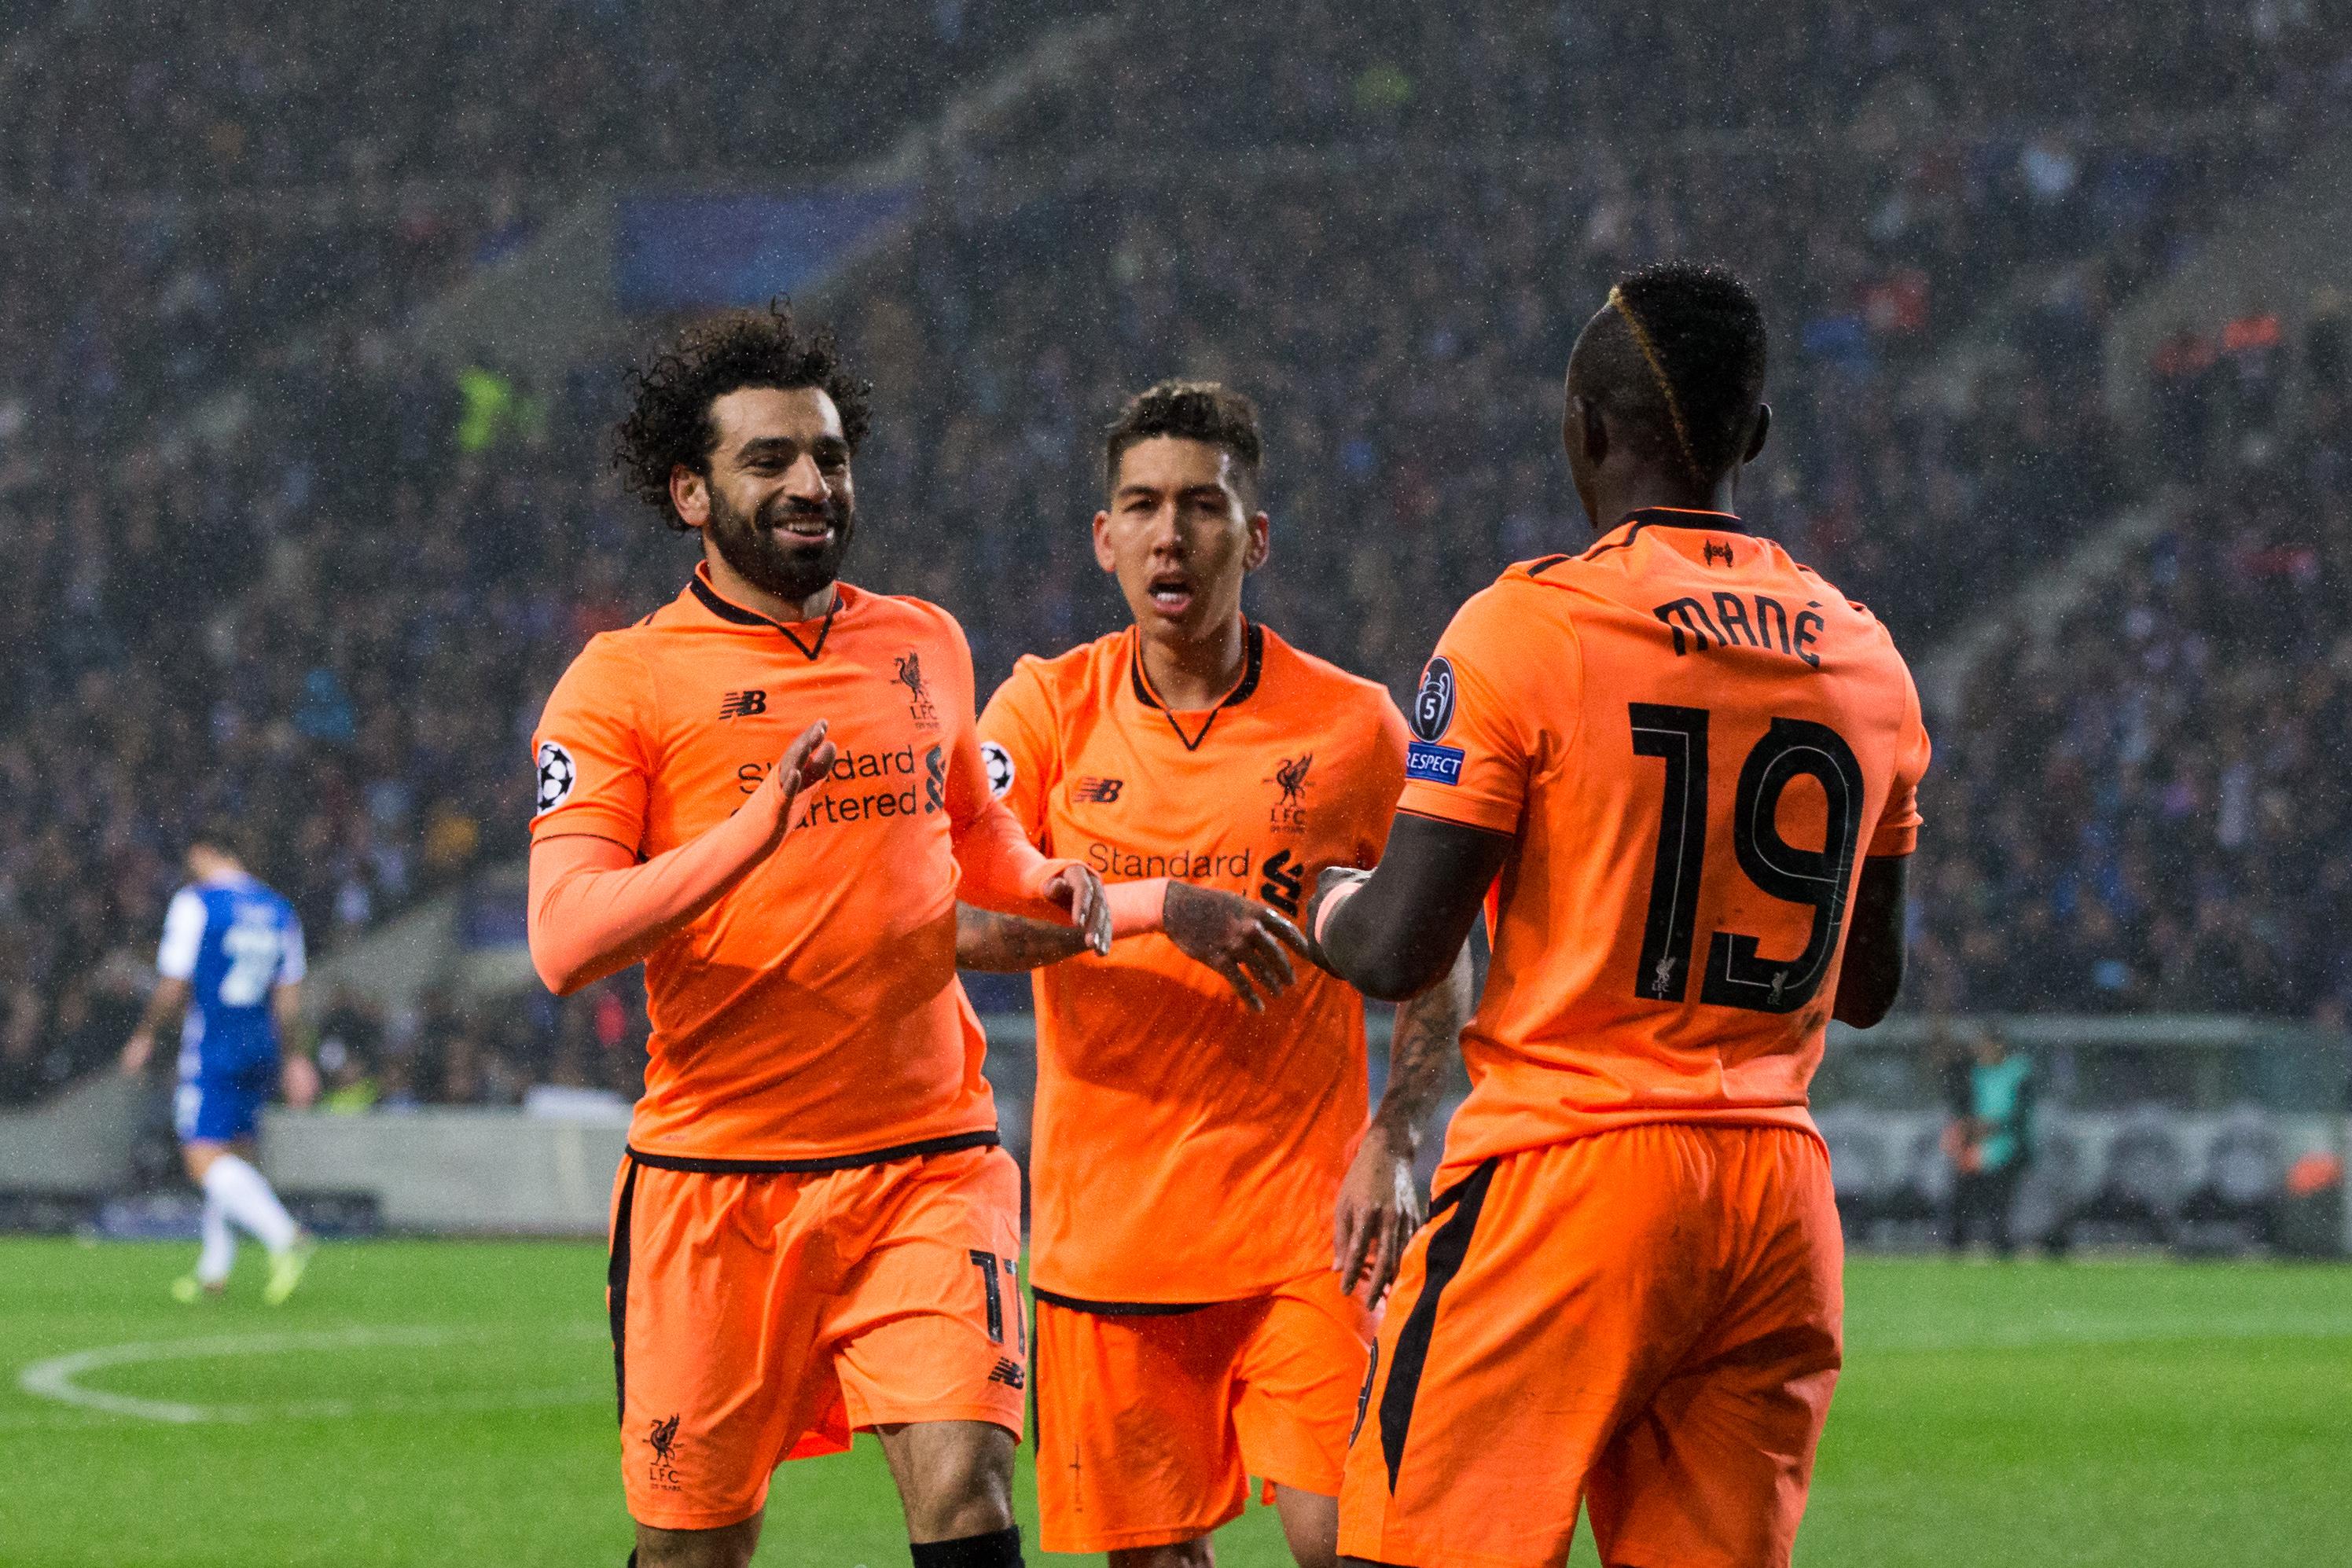 Mohamed Salah - Liverpool and Egypt